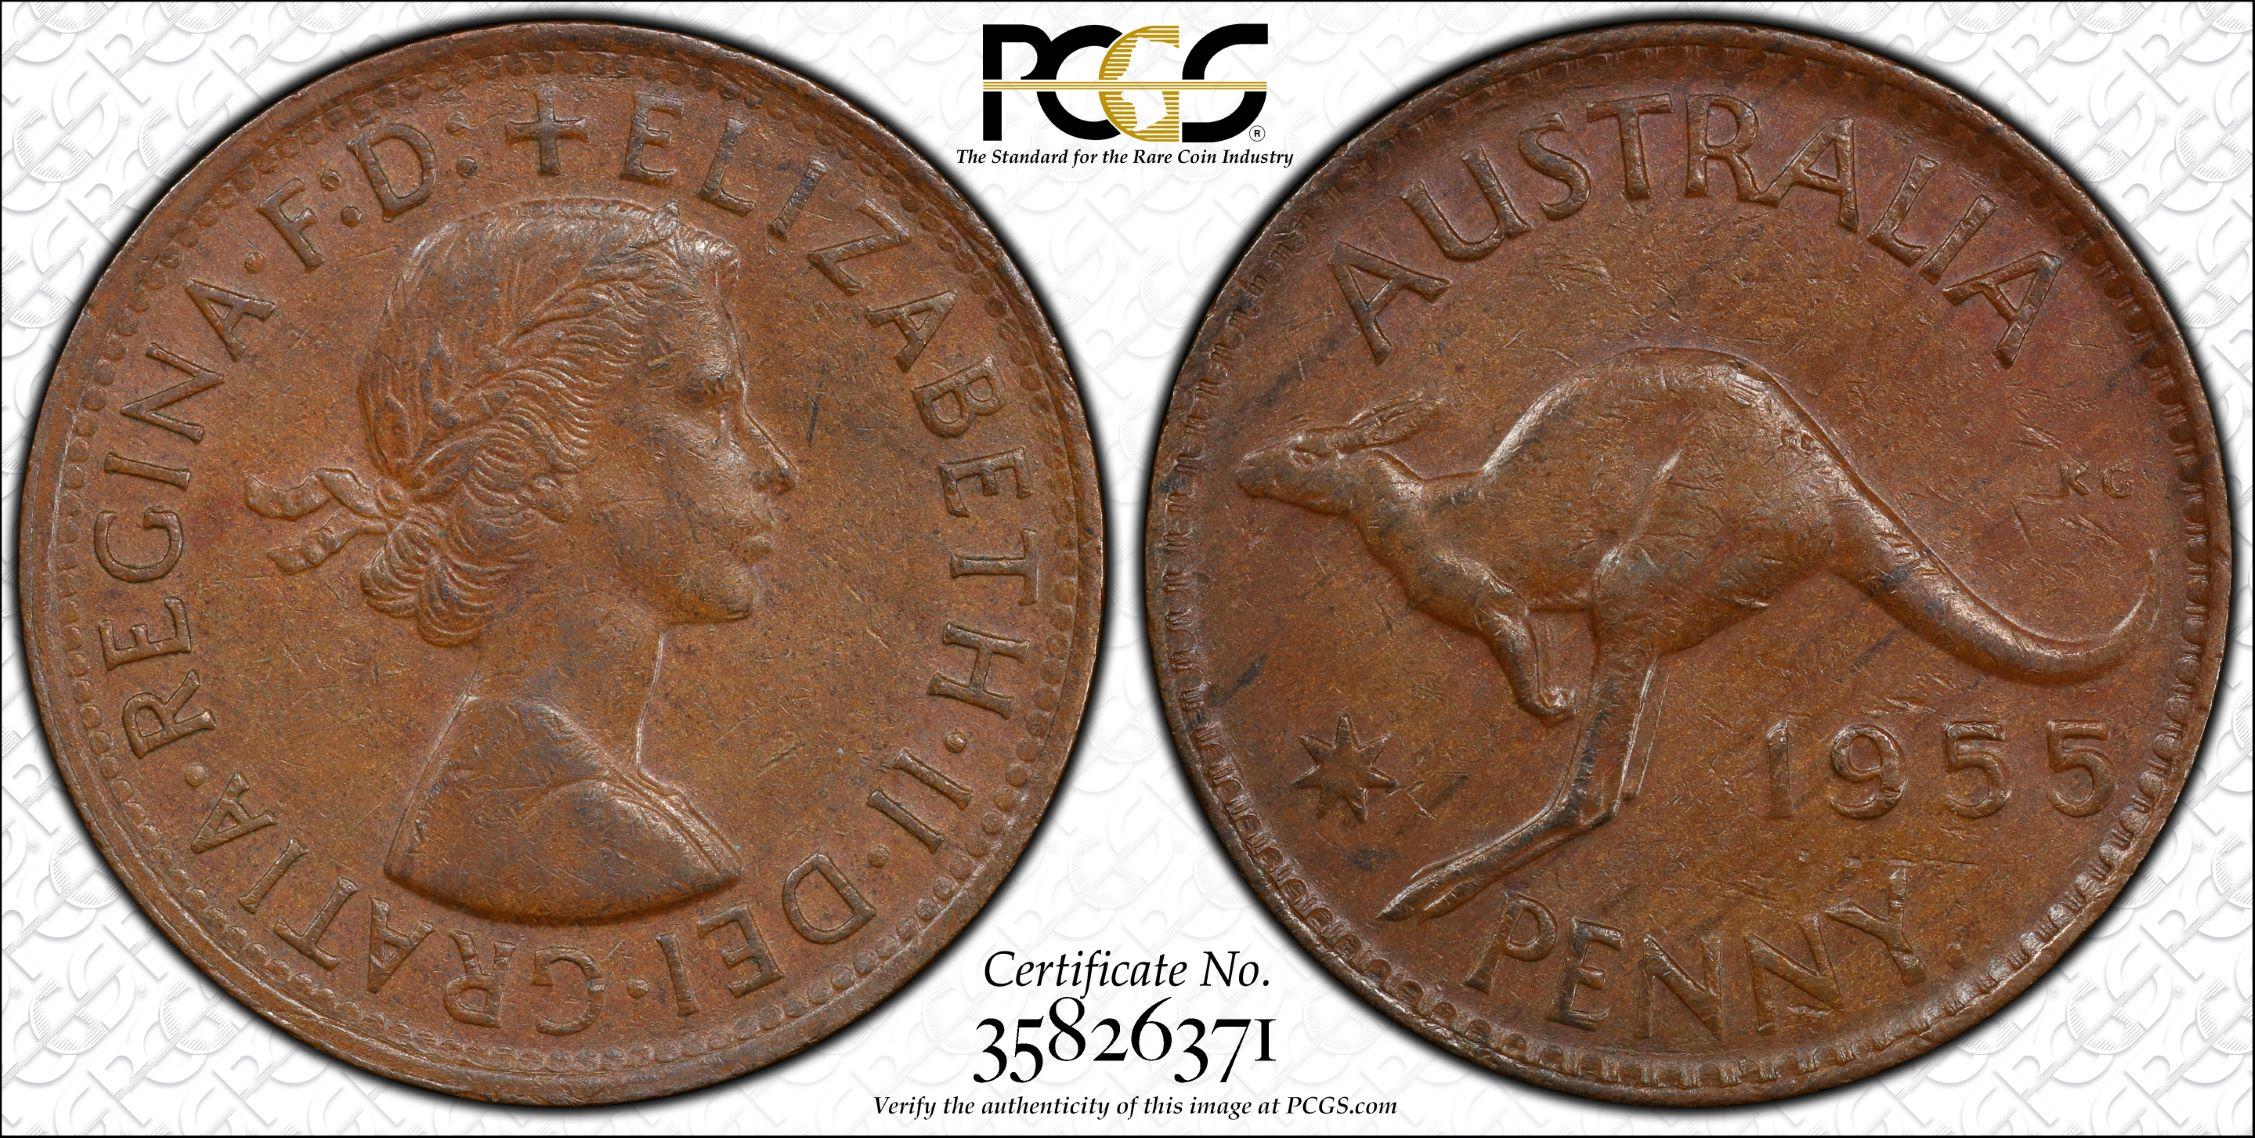 Australia 1955 Perth Obverse Penny PCGS AU53